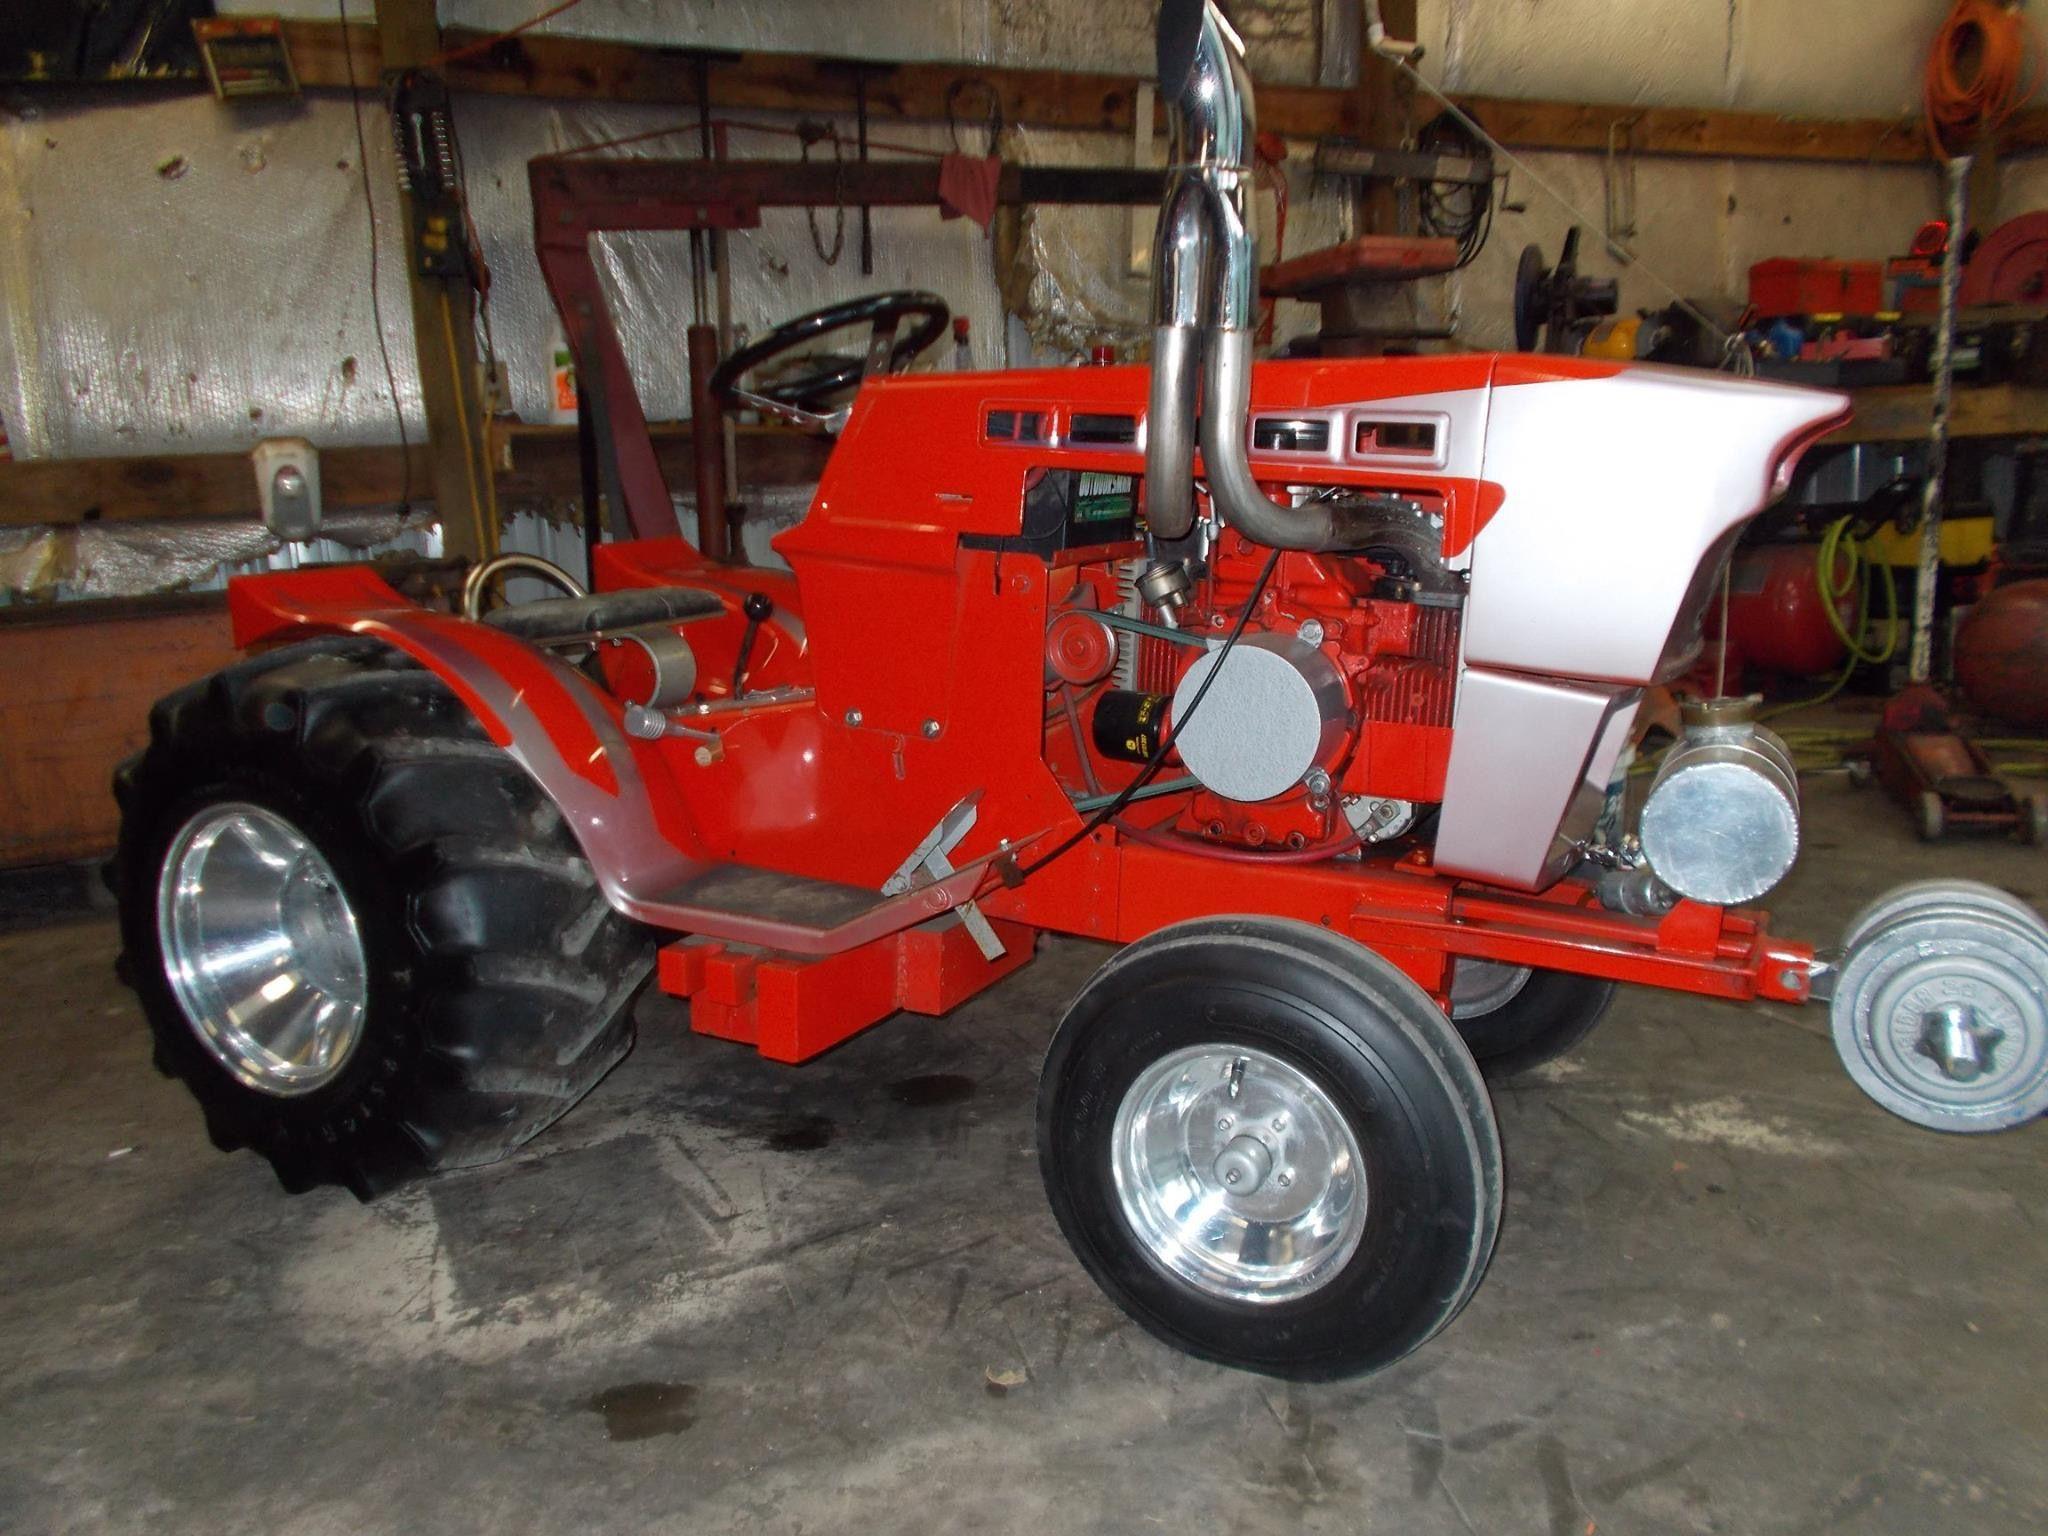 17 Best 1000 images about Garden tractors on Pinterest Gardens Atv